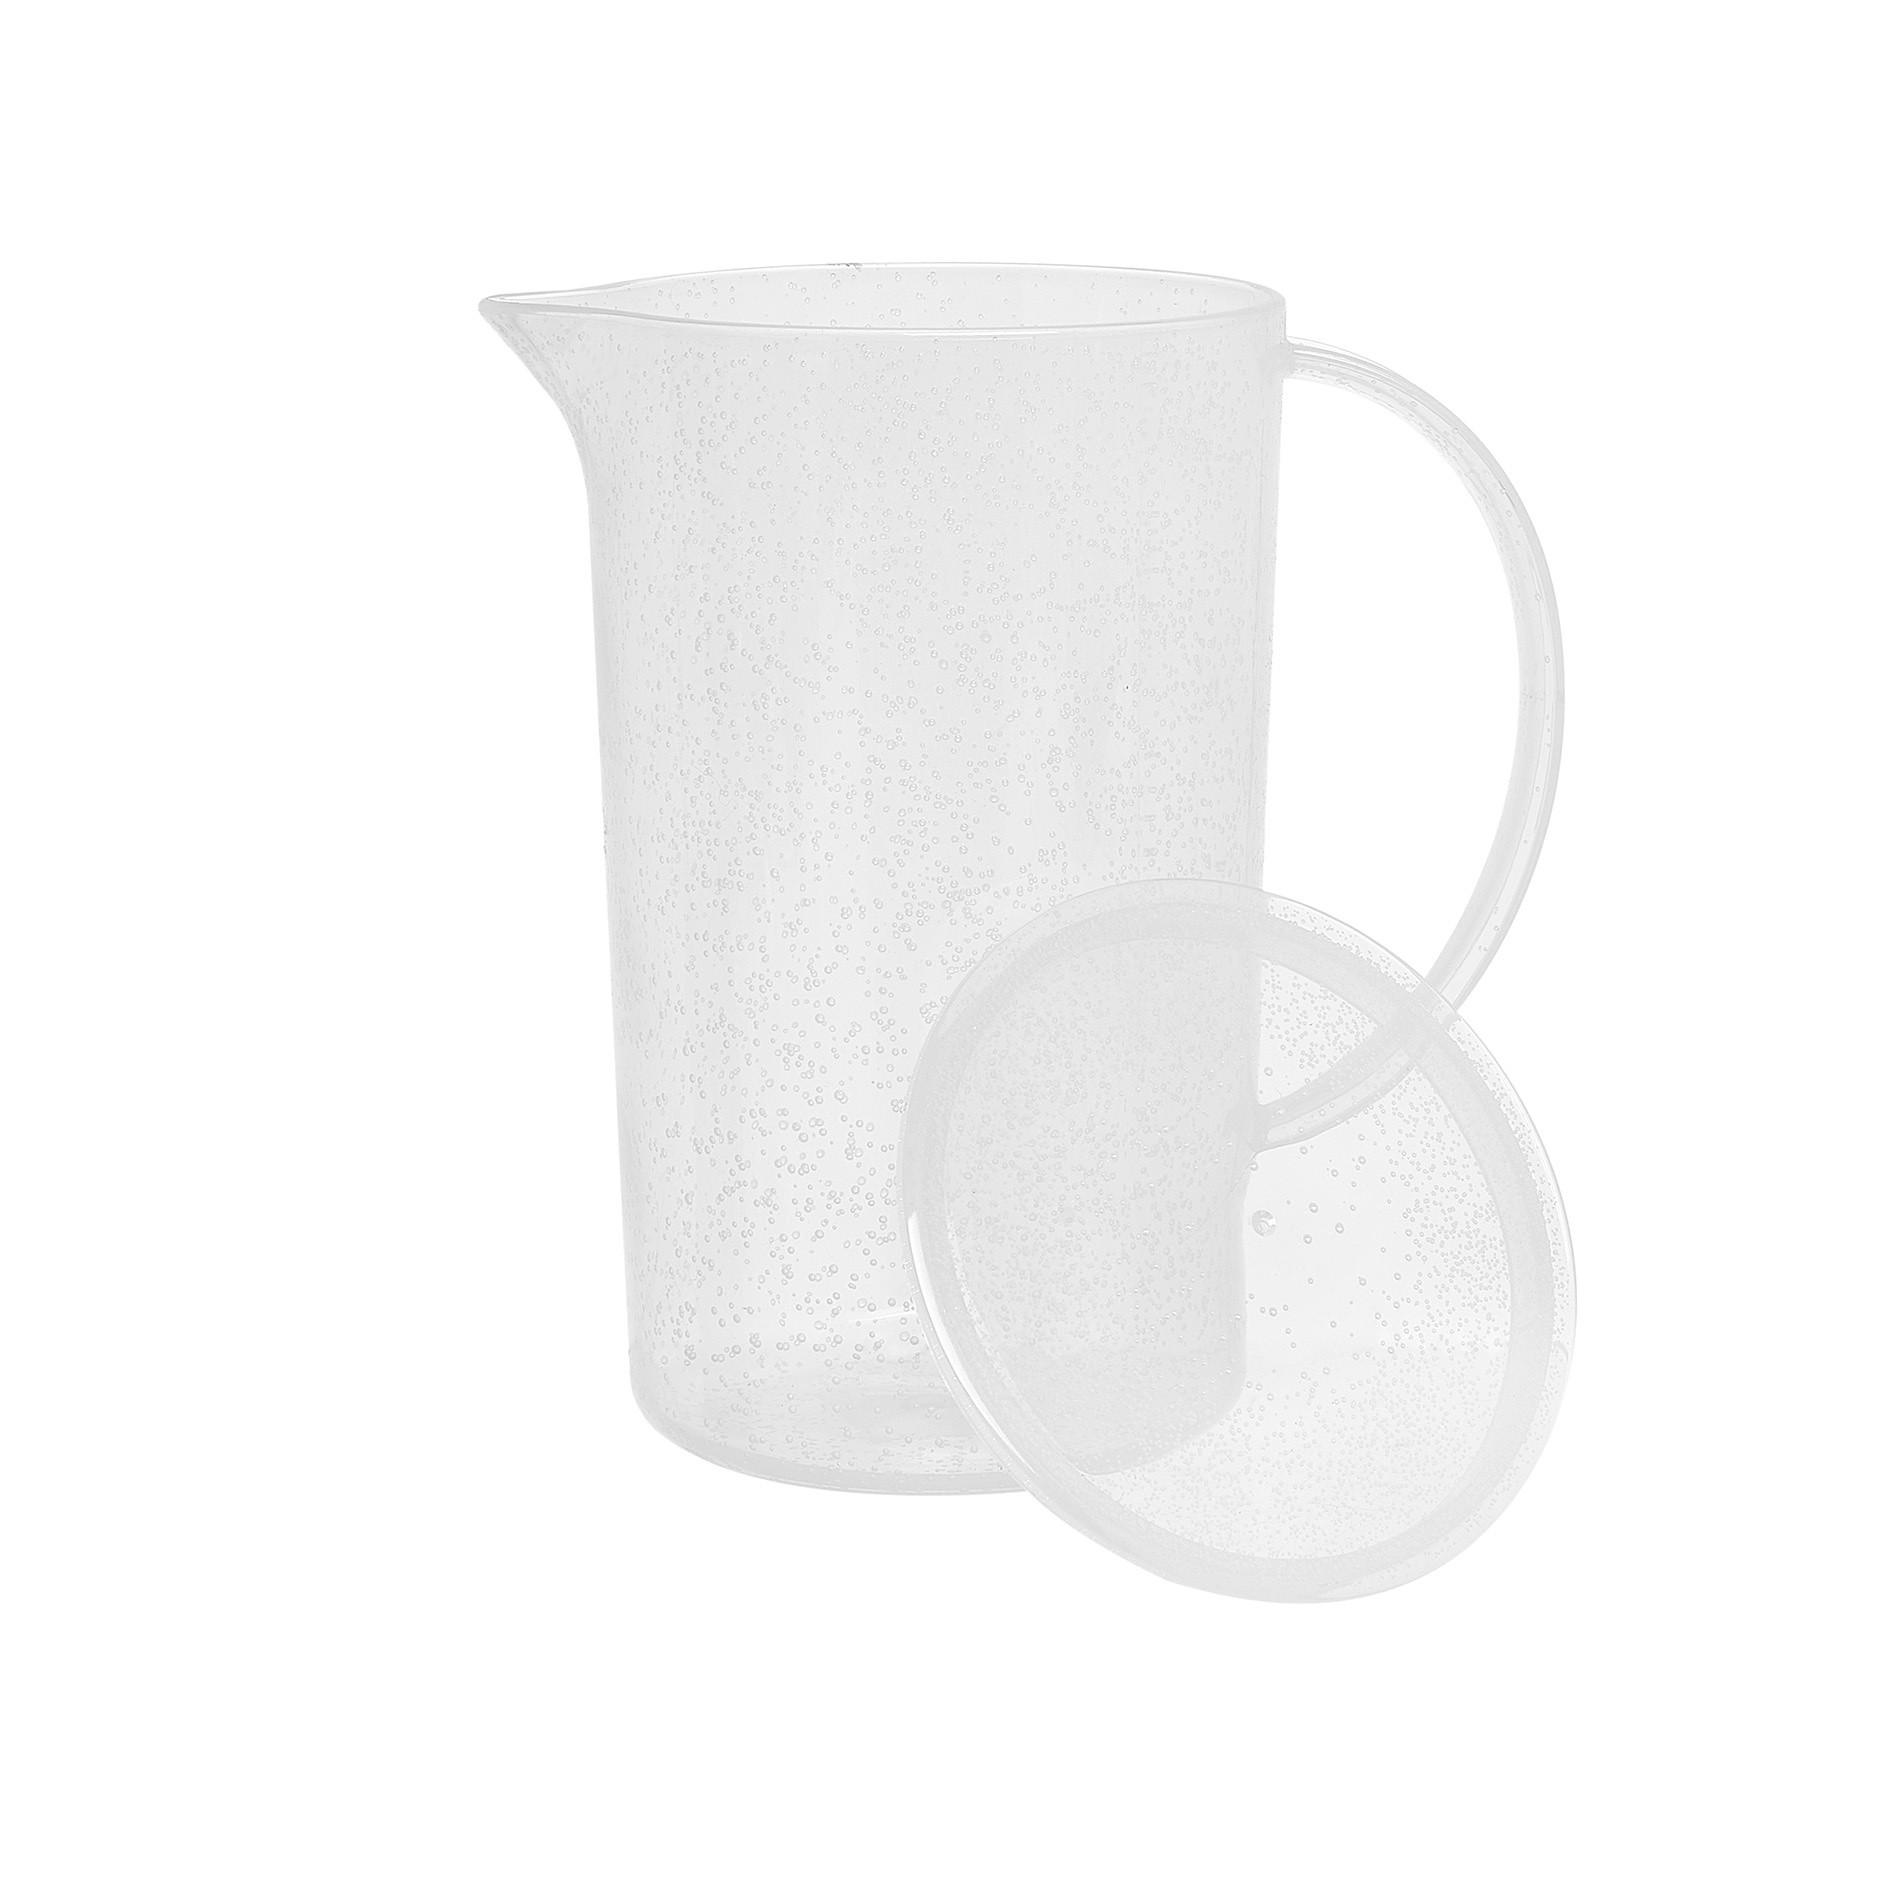 Caraffa plastica bolle, Bianco, large image number 1